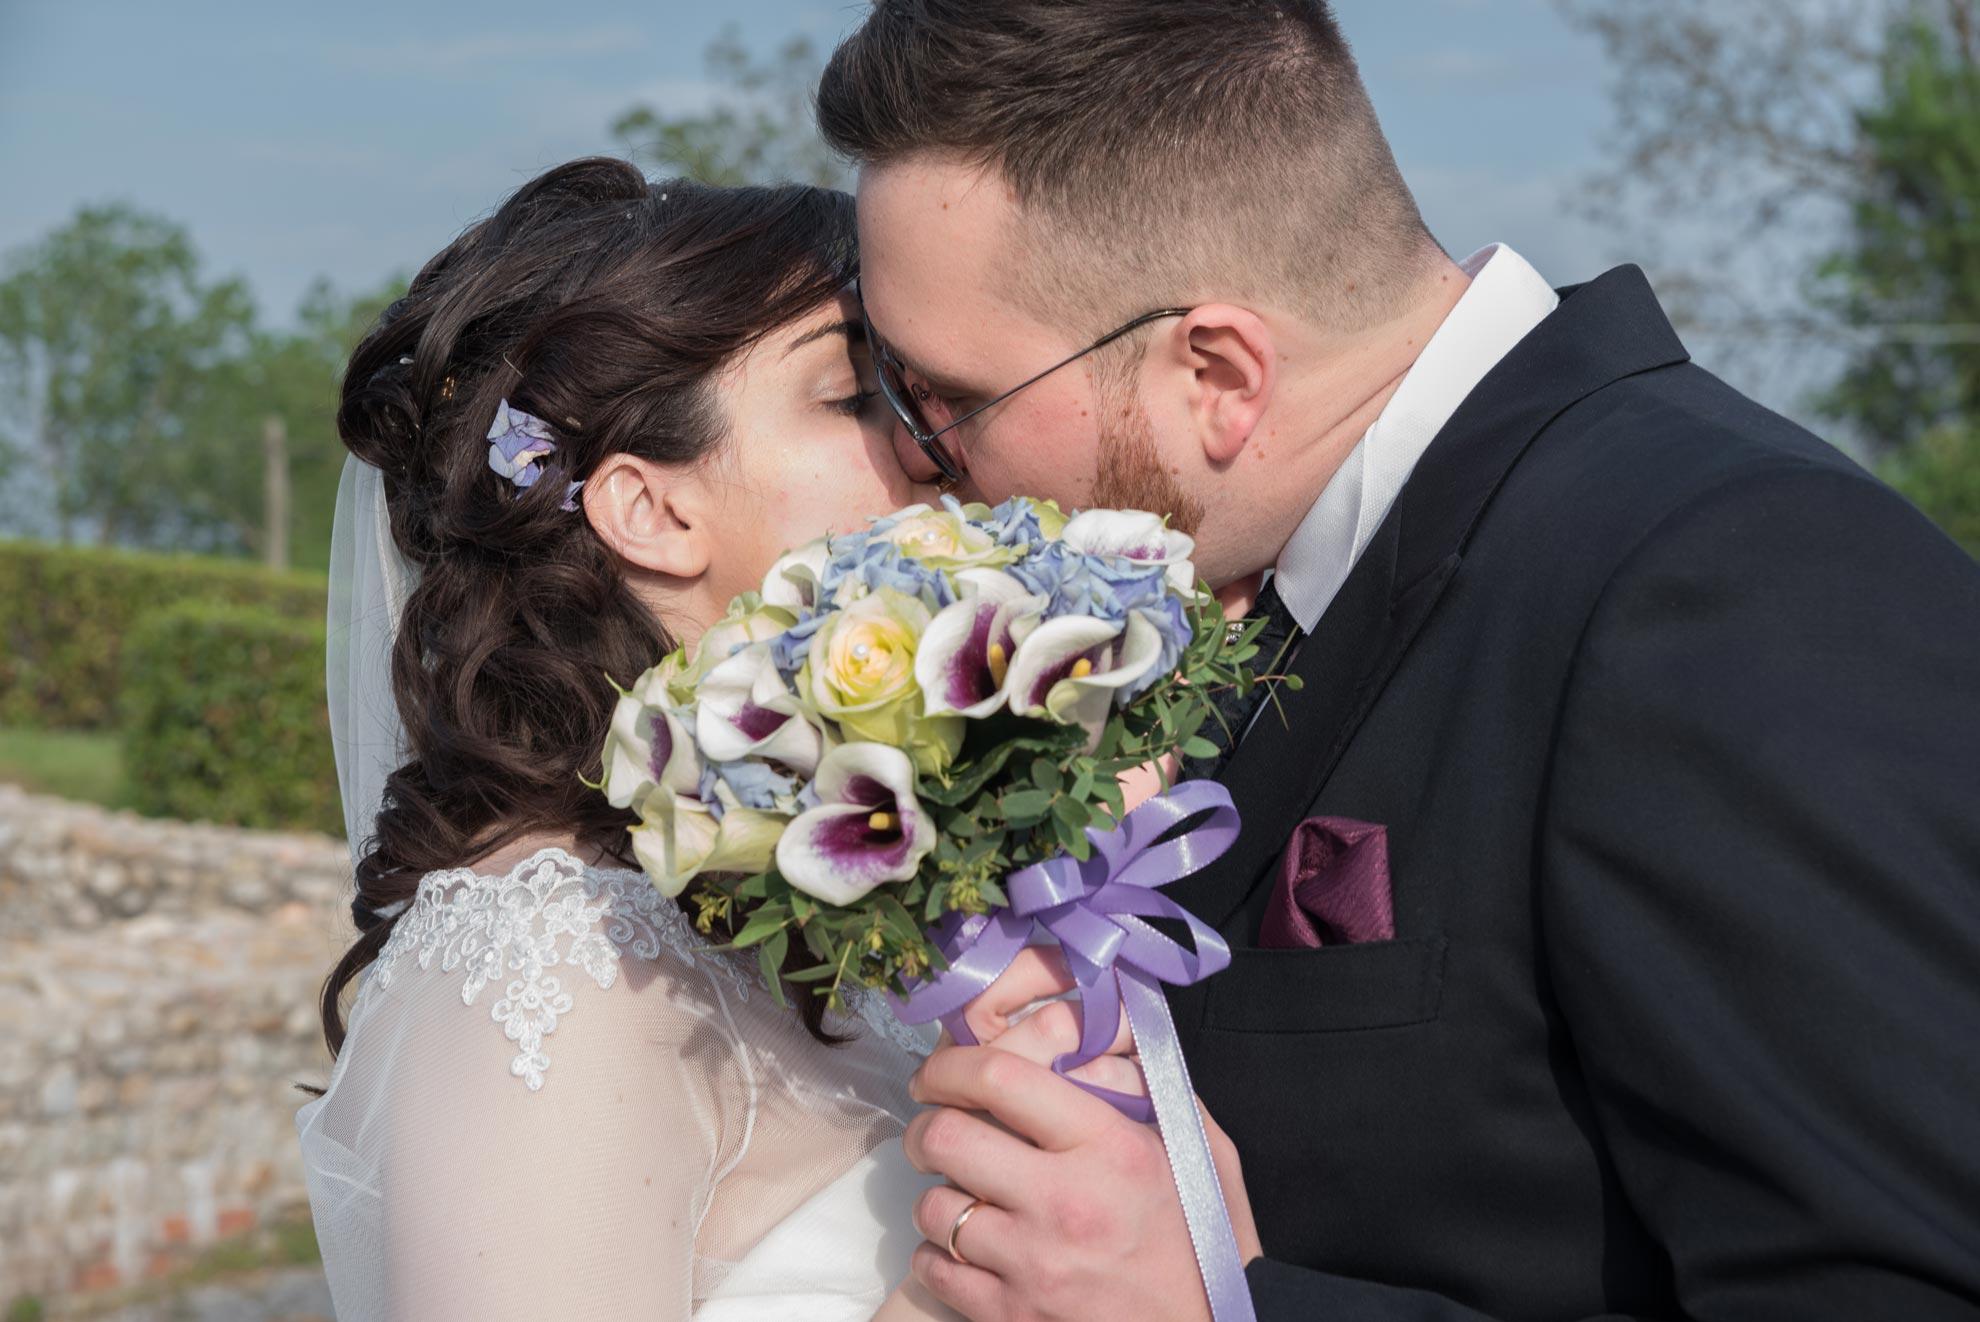 Matrimonio a Narzole Lorenza Diego - DSC 3214 - Fotografie matrimonio con buchè - Fotografie matrimonio con buchè